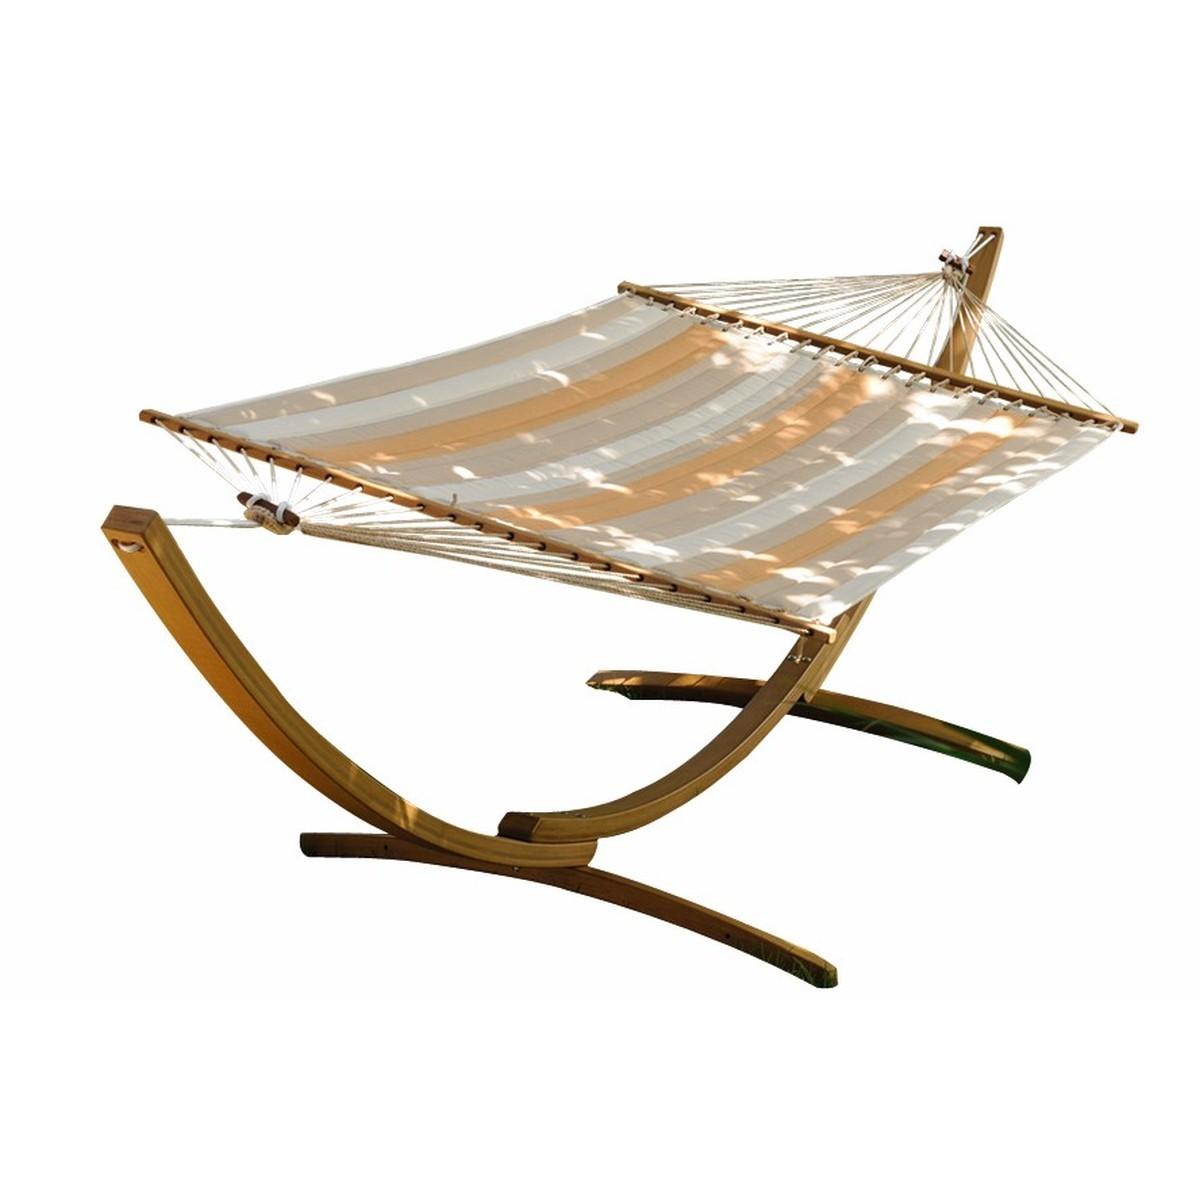 hamac pas cher avec support good hamac avec support bois. Black Bedroom Furniture Sets. Home Design Ideas